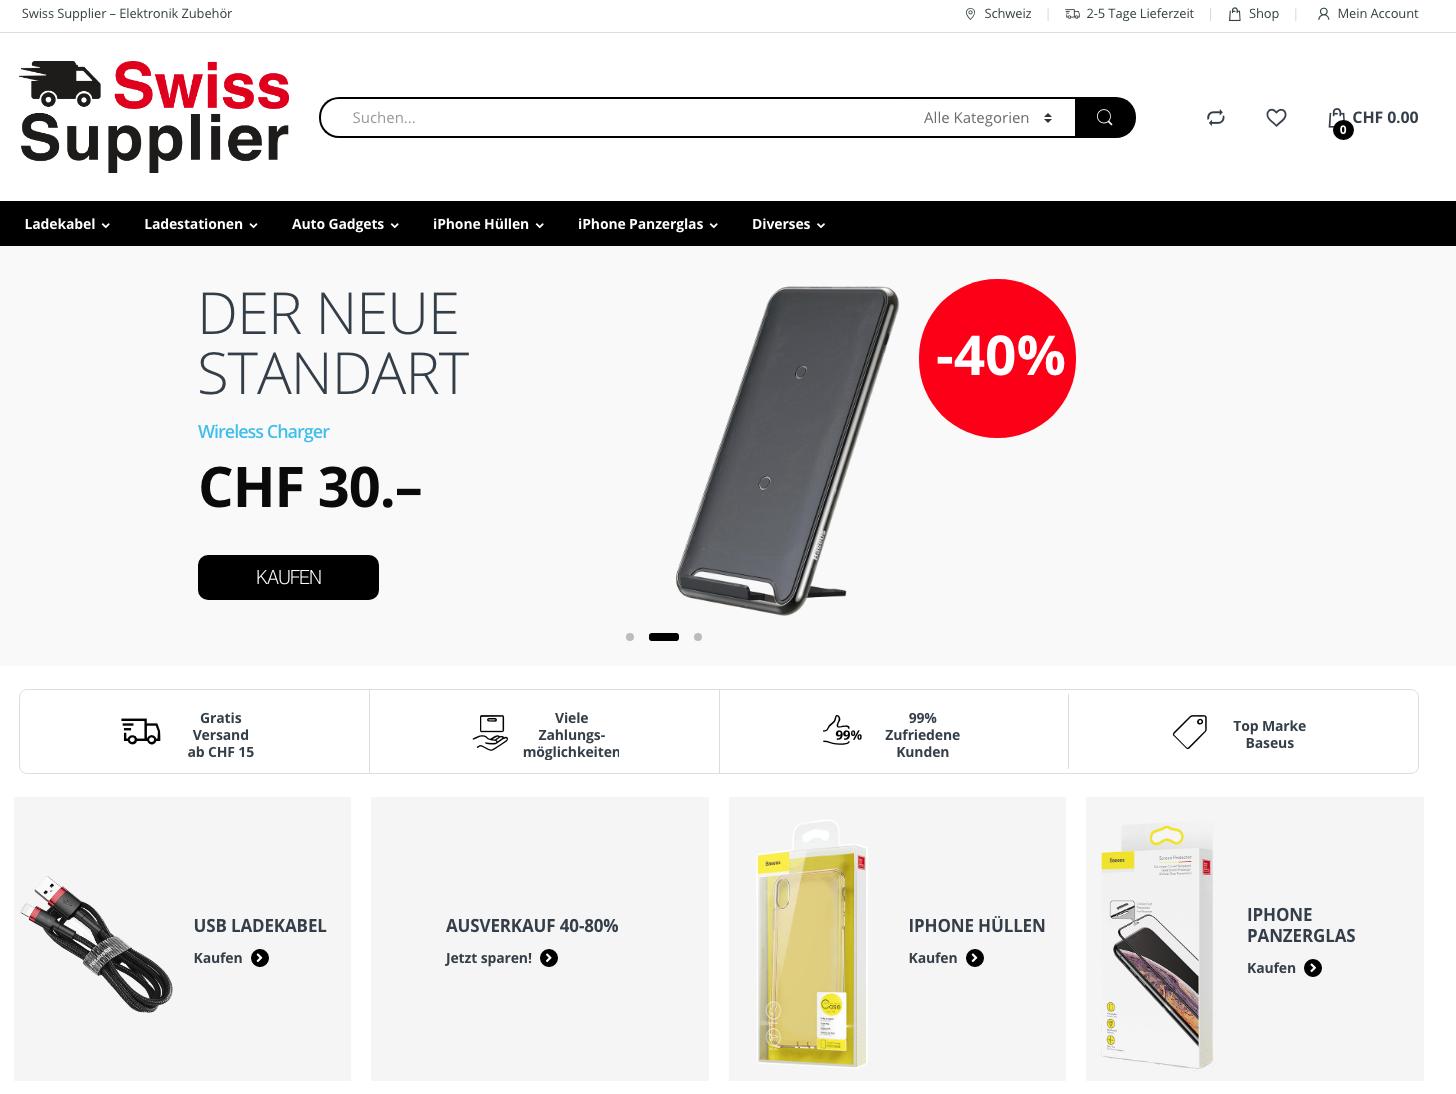 Verkaufe Onlineshop inklusive Produkte